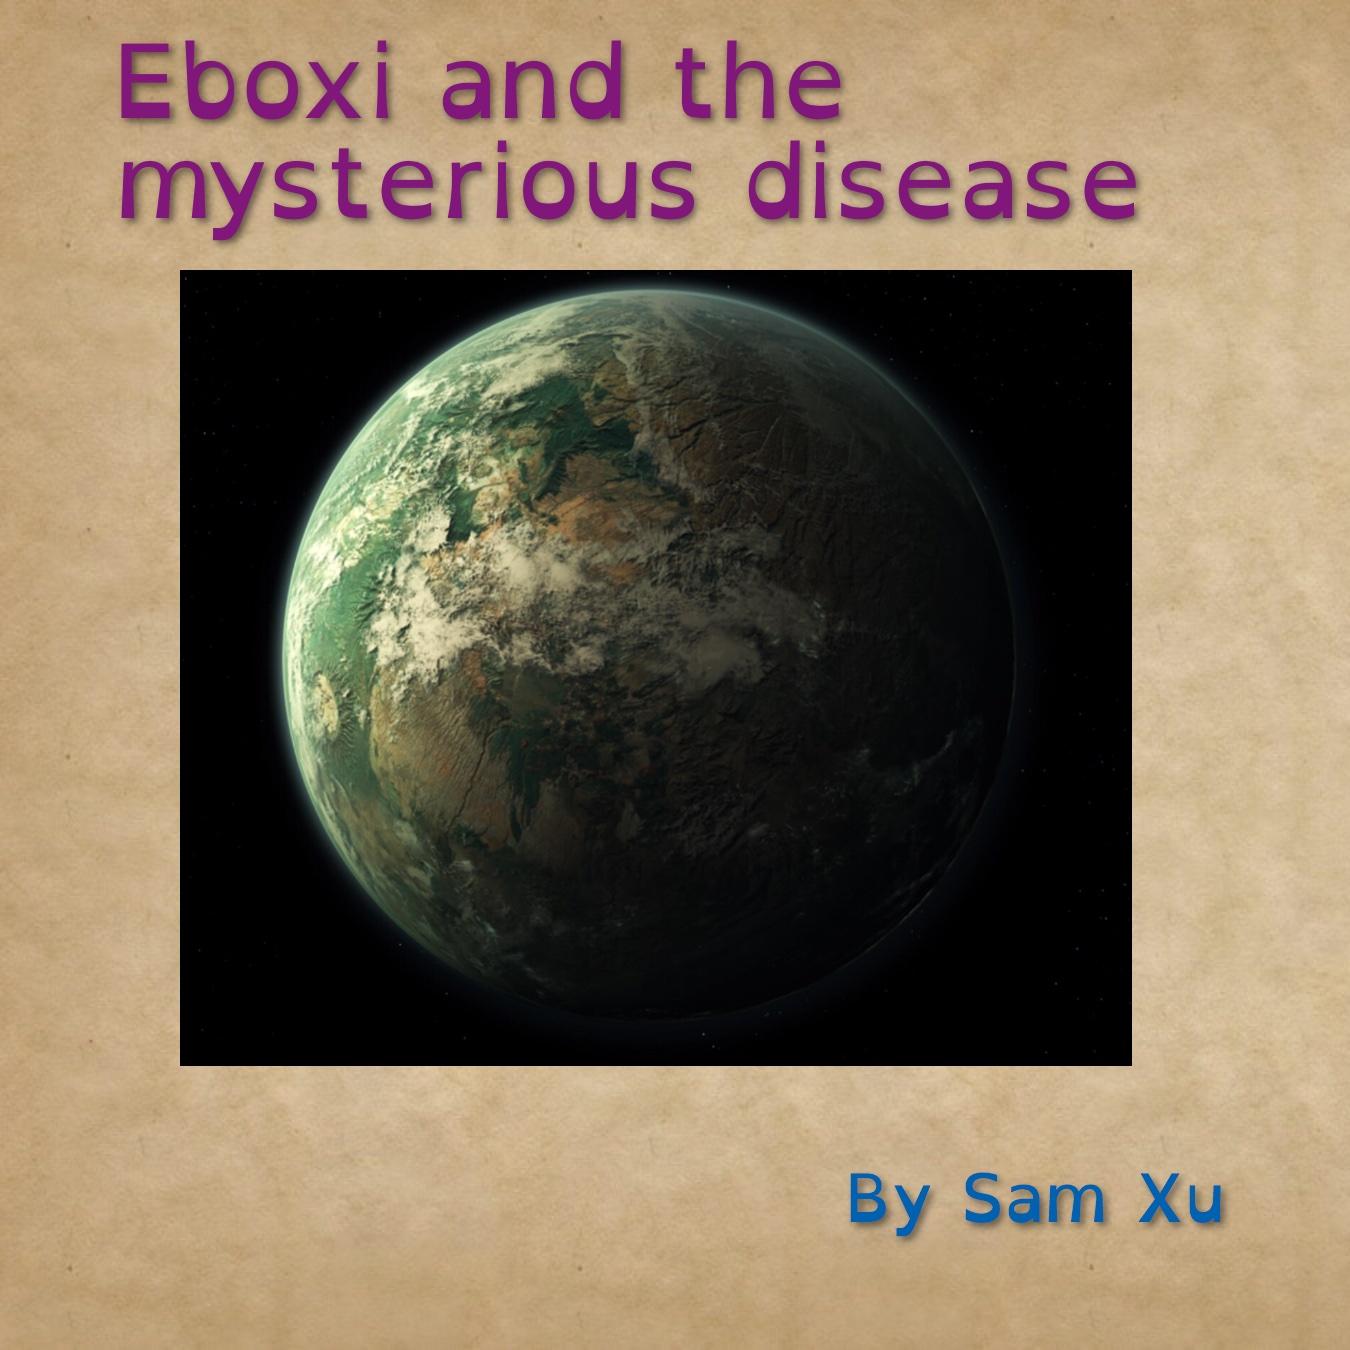 Eboxi #1: Eboxi and the mysterious disease